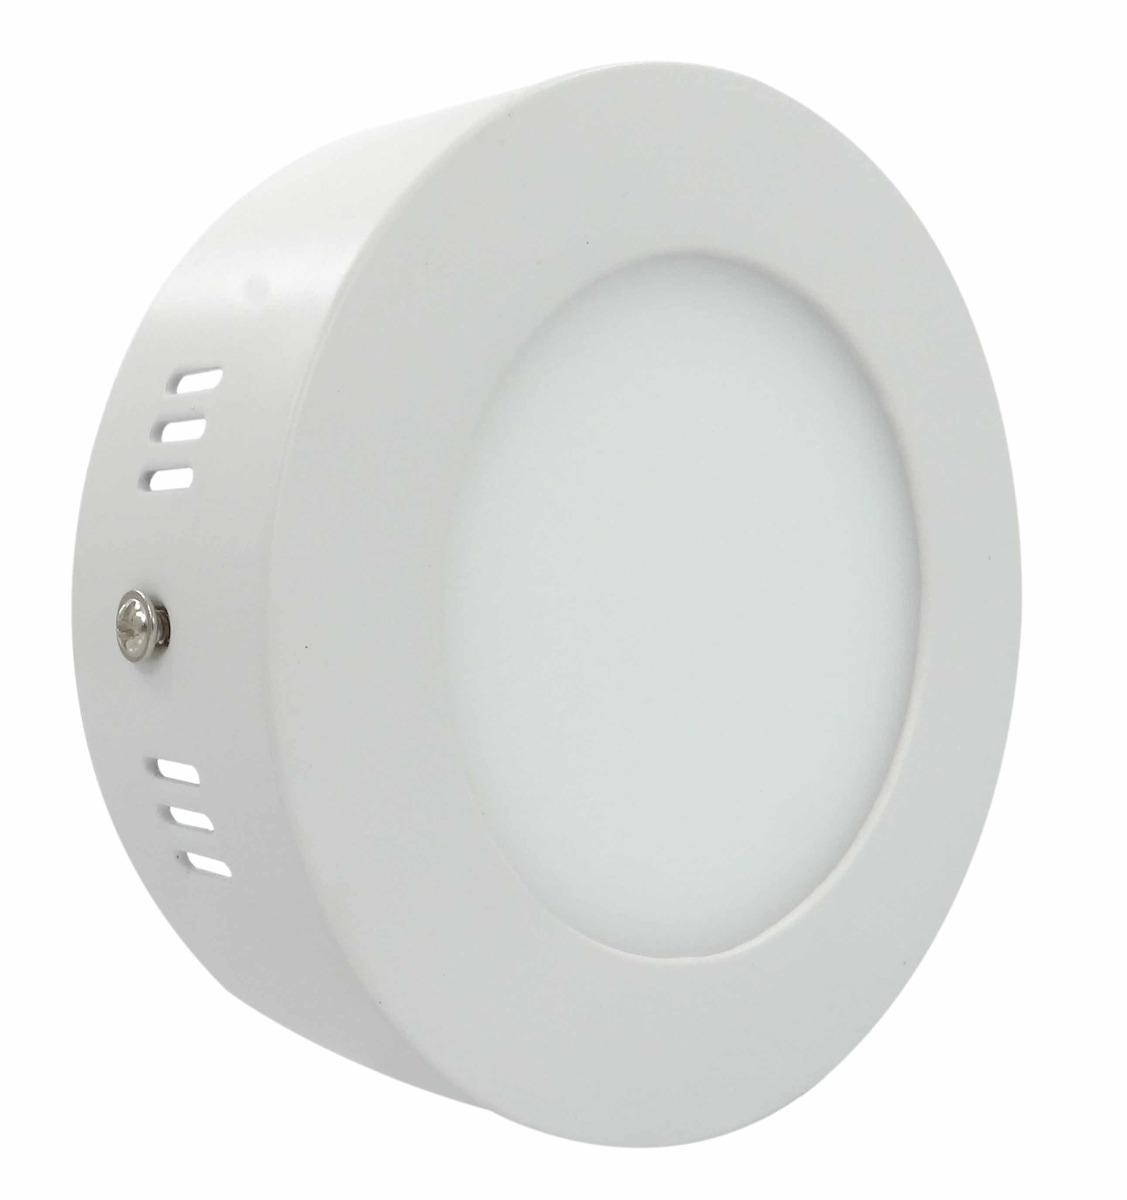 Painel Plafon Redondo Luminária Sobrepor Led 6w Bivolt Branco Quente - RPC-COMMERCE